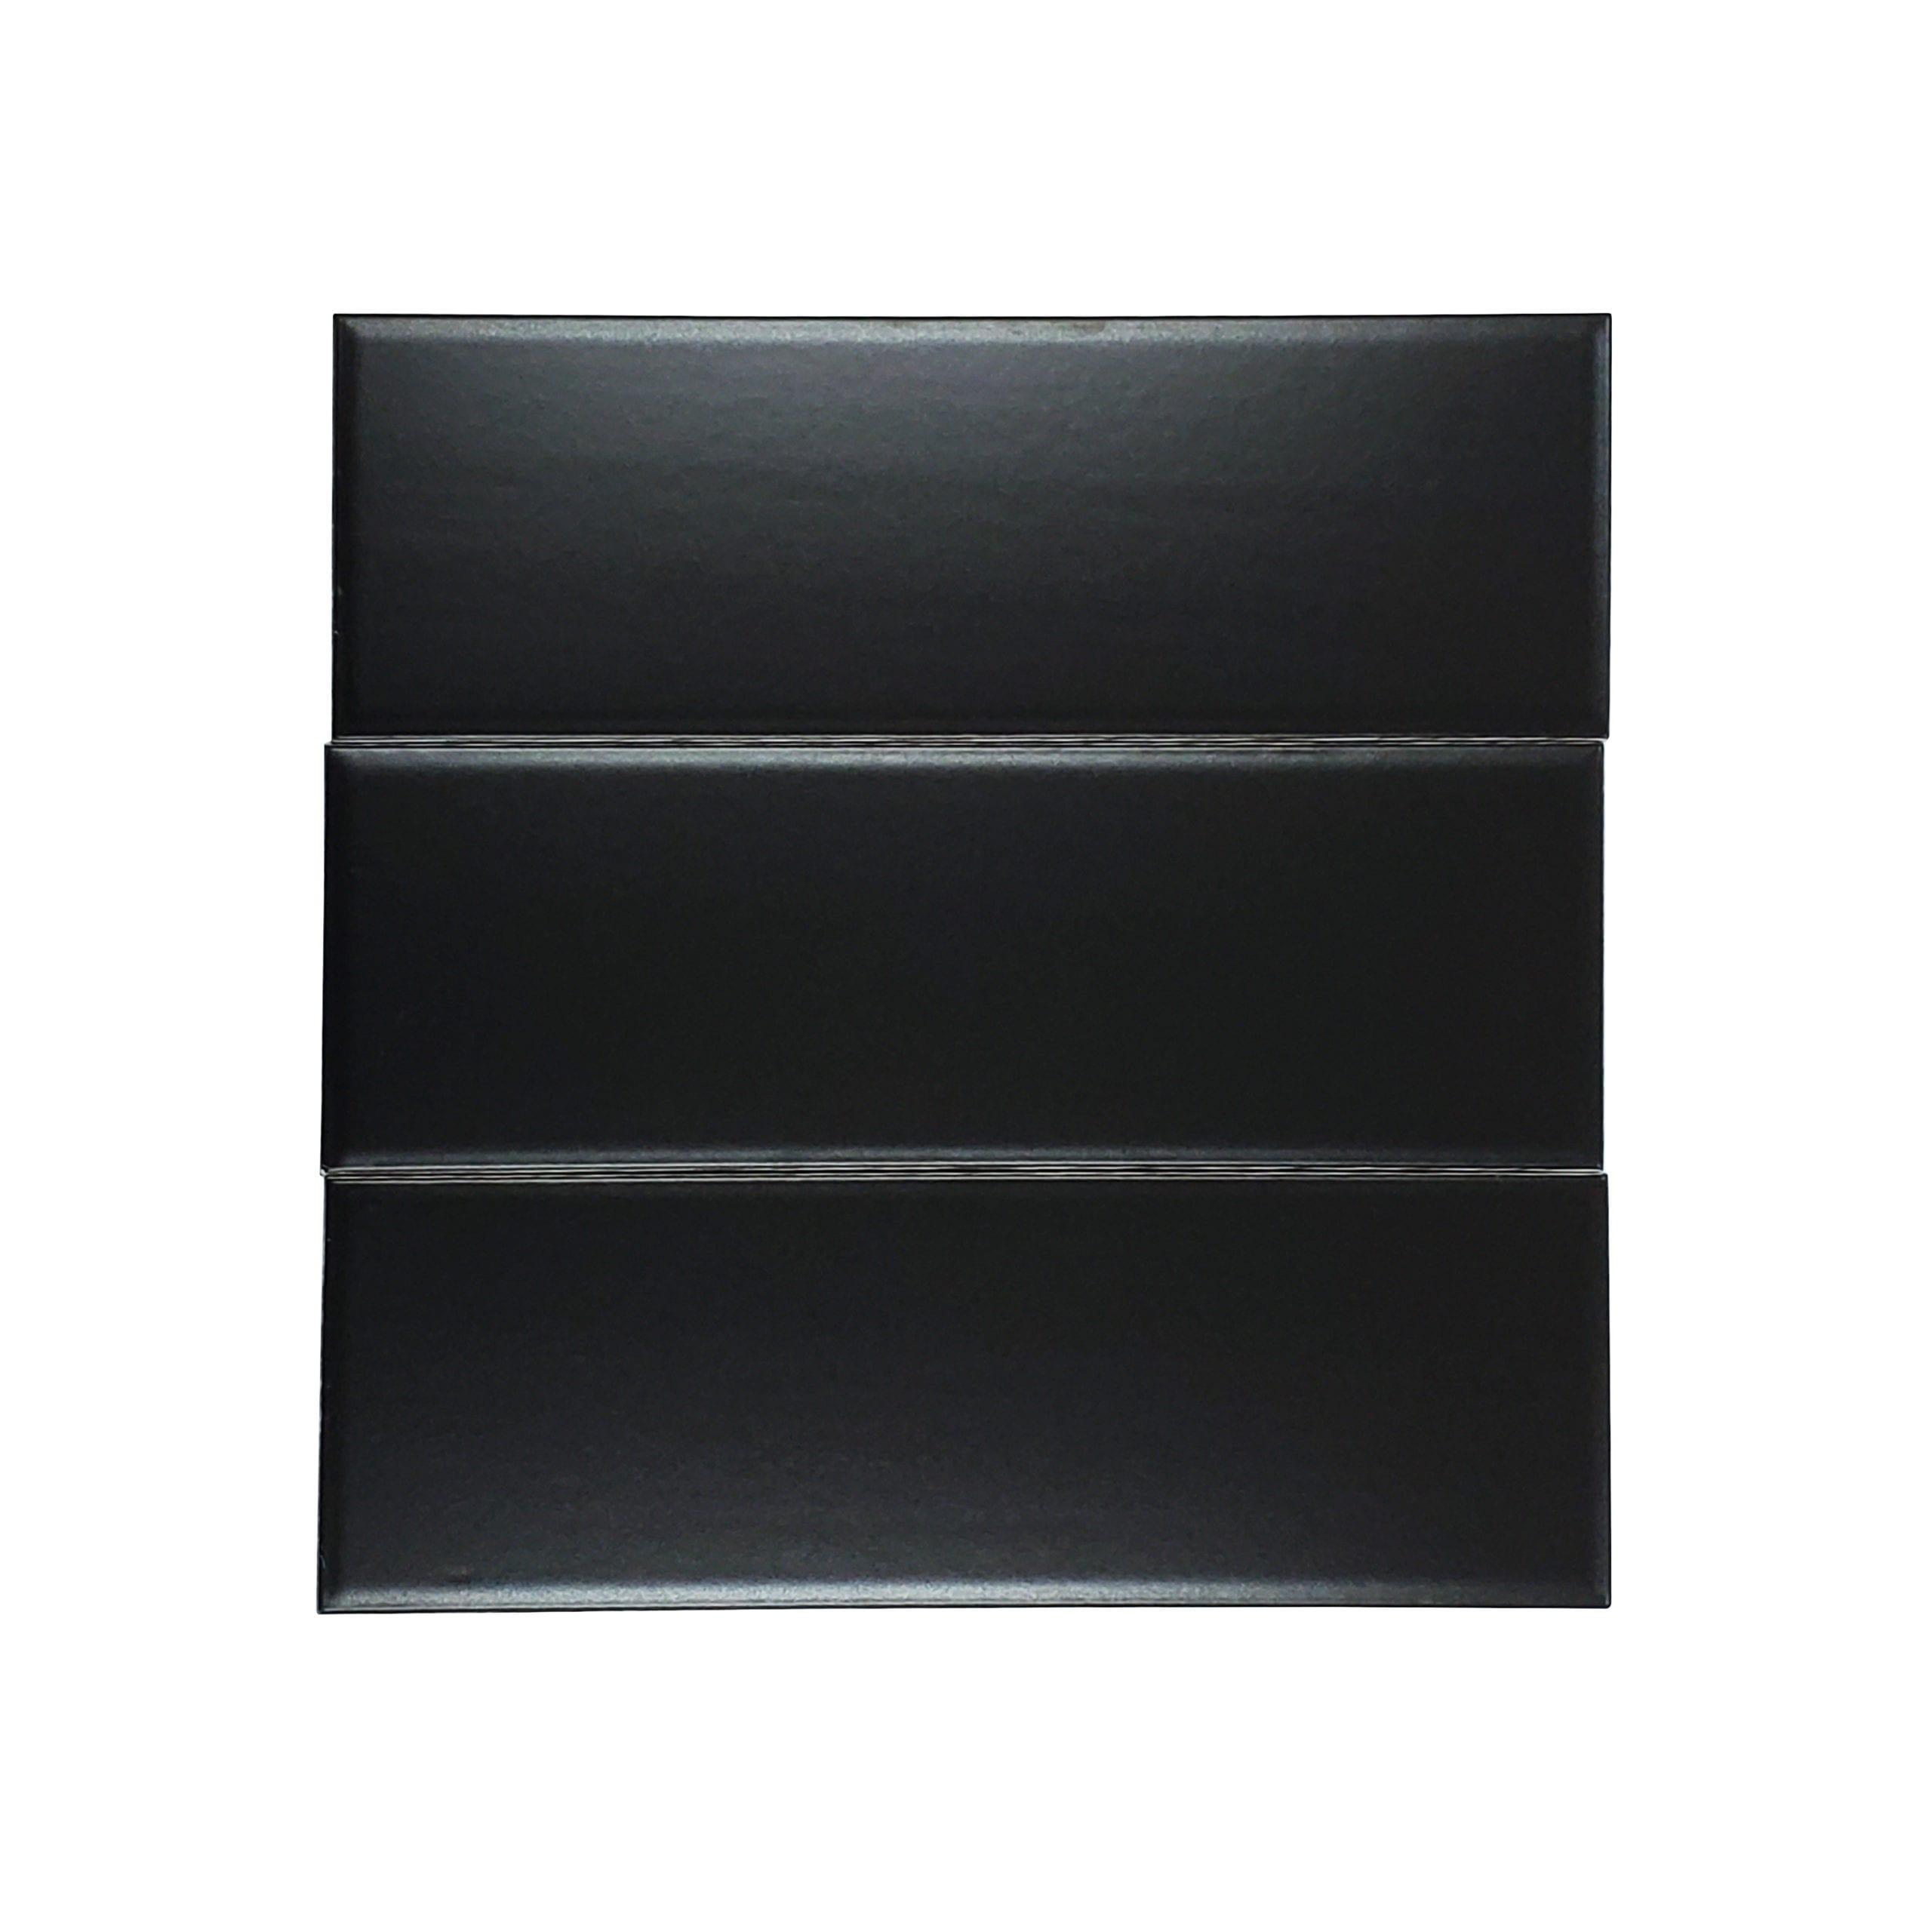 4×12 Flat Glossy Subway Tile_Black_10.33sfct_3.49_2.29